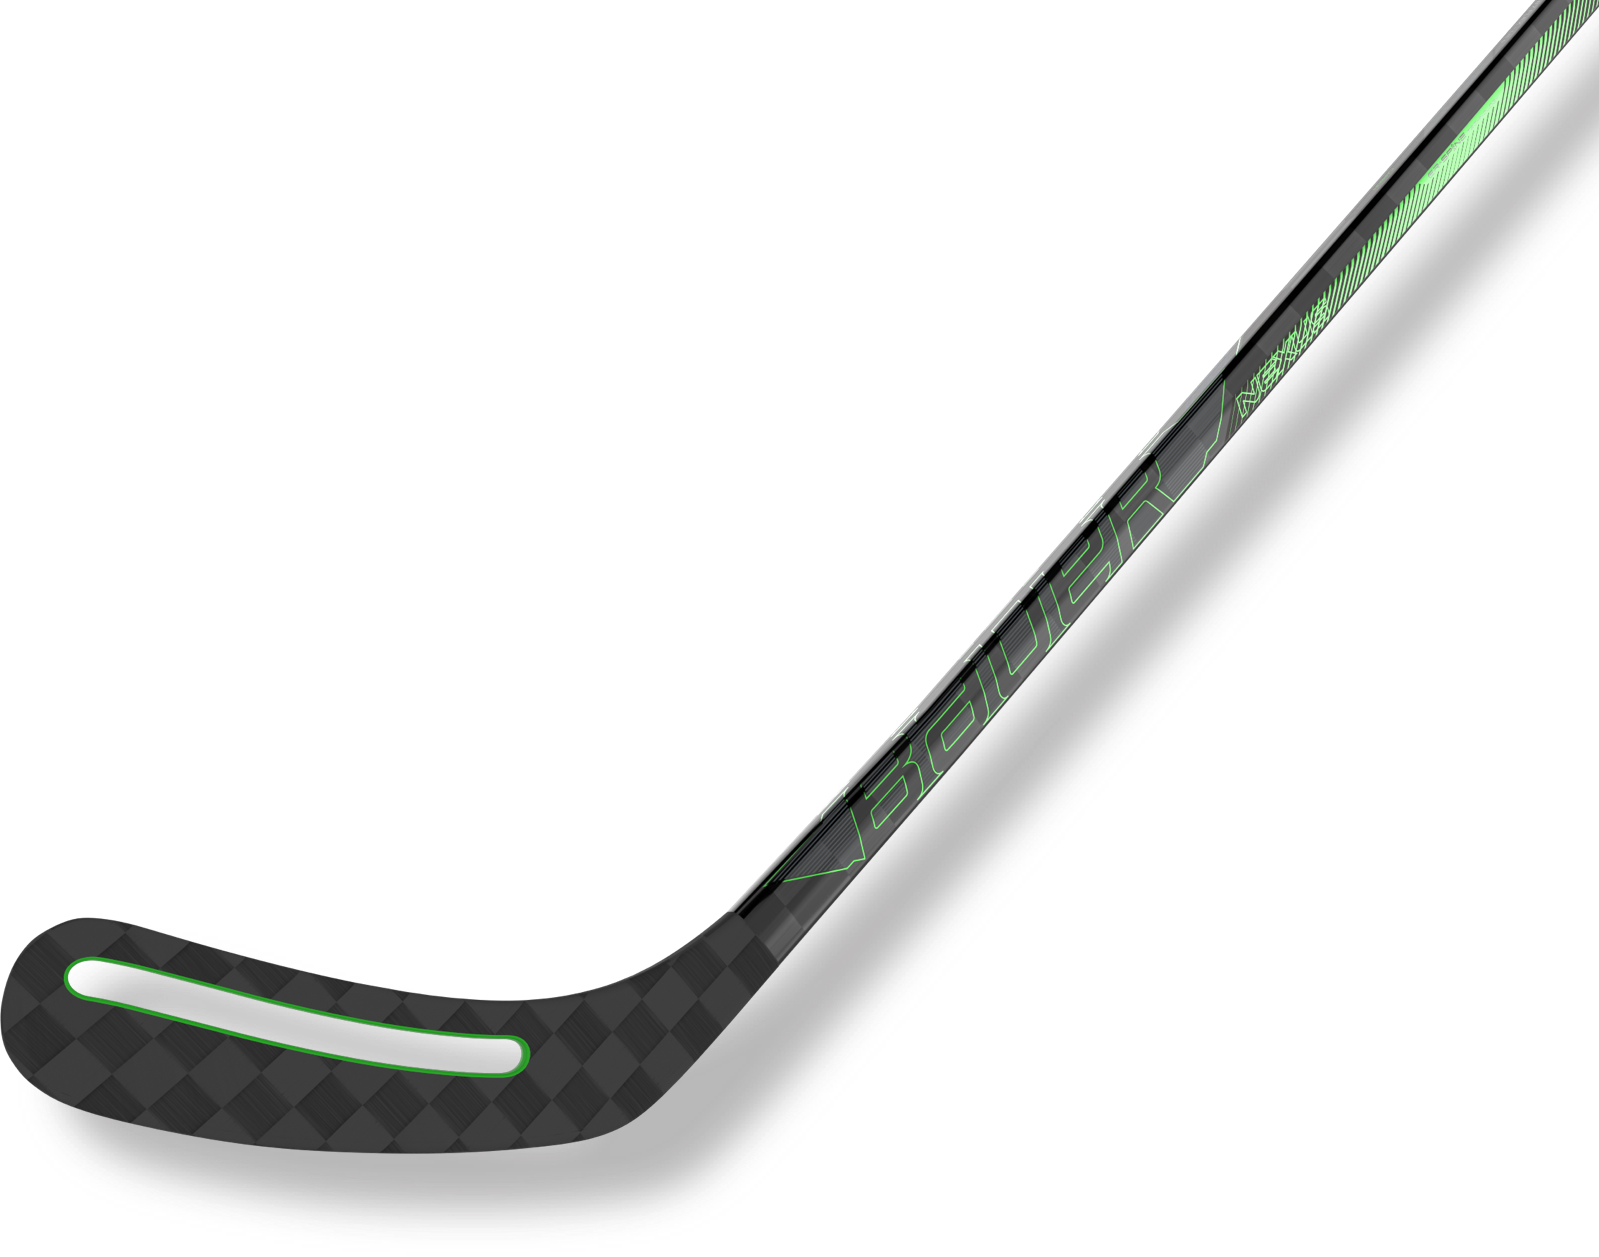 Nexus-Adv-TopBanner-Stick